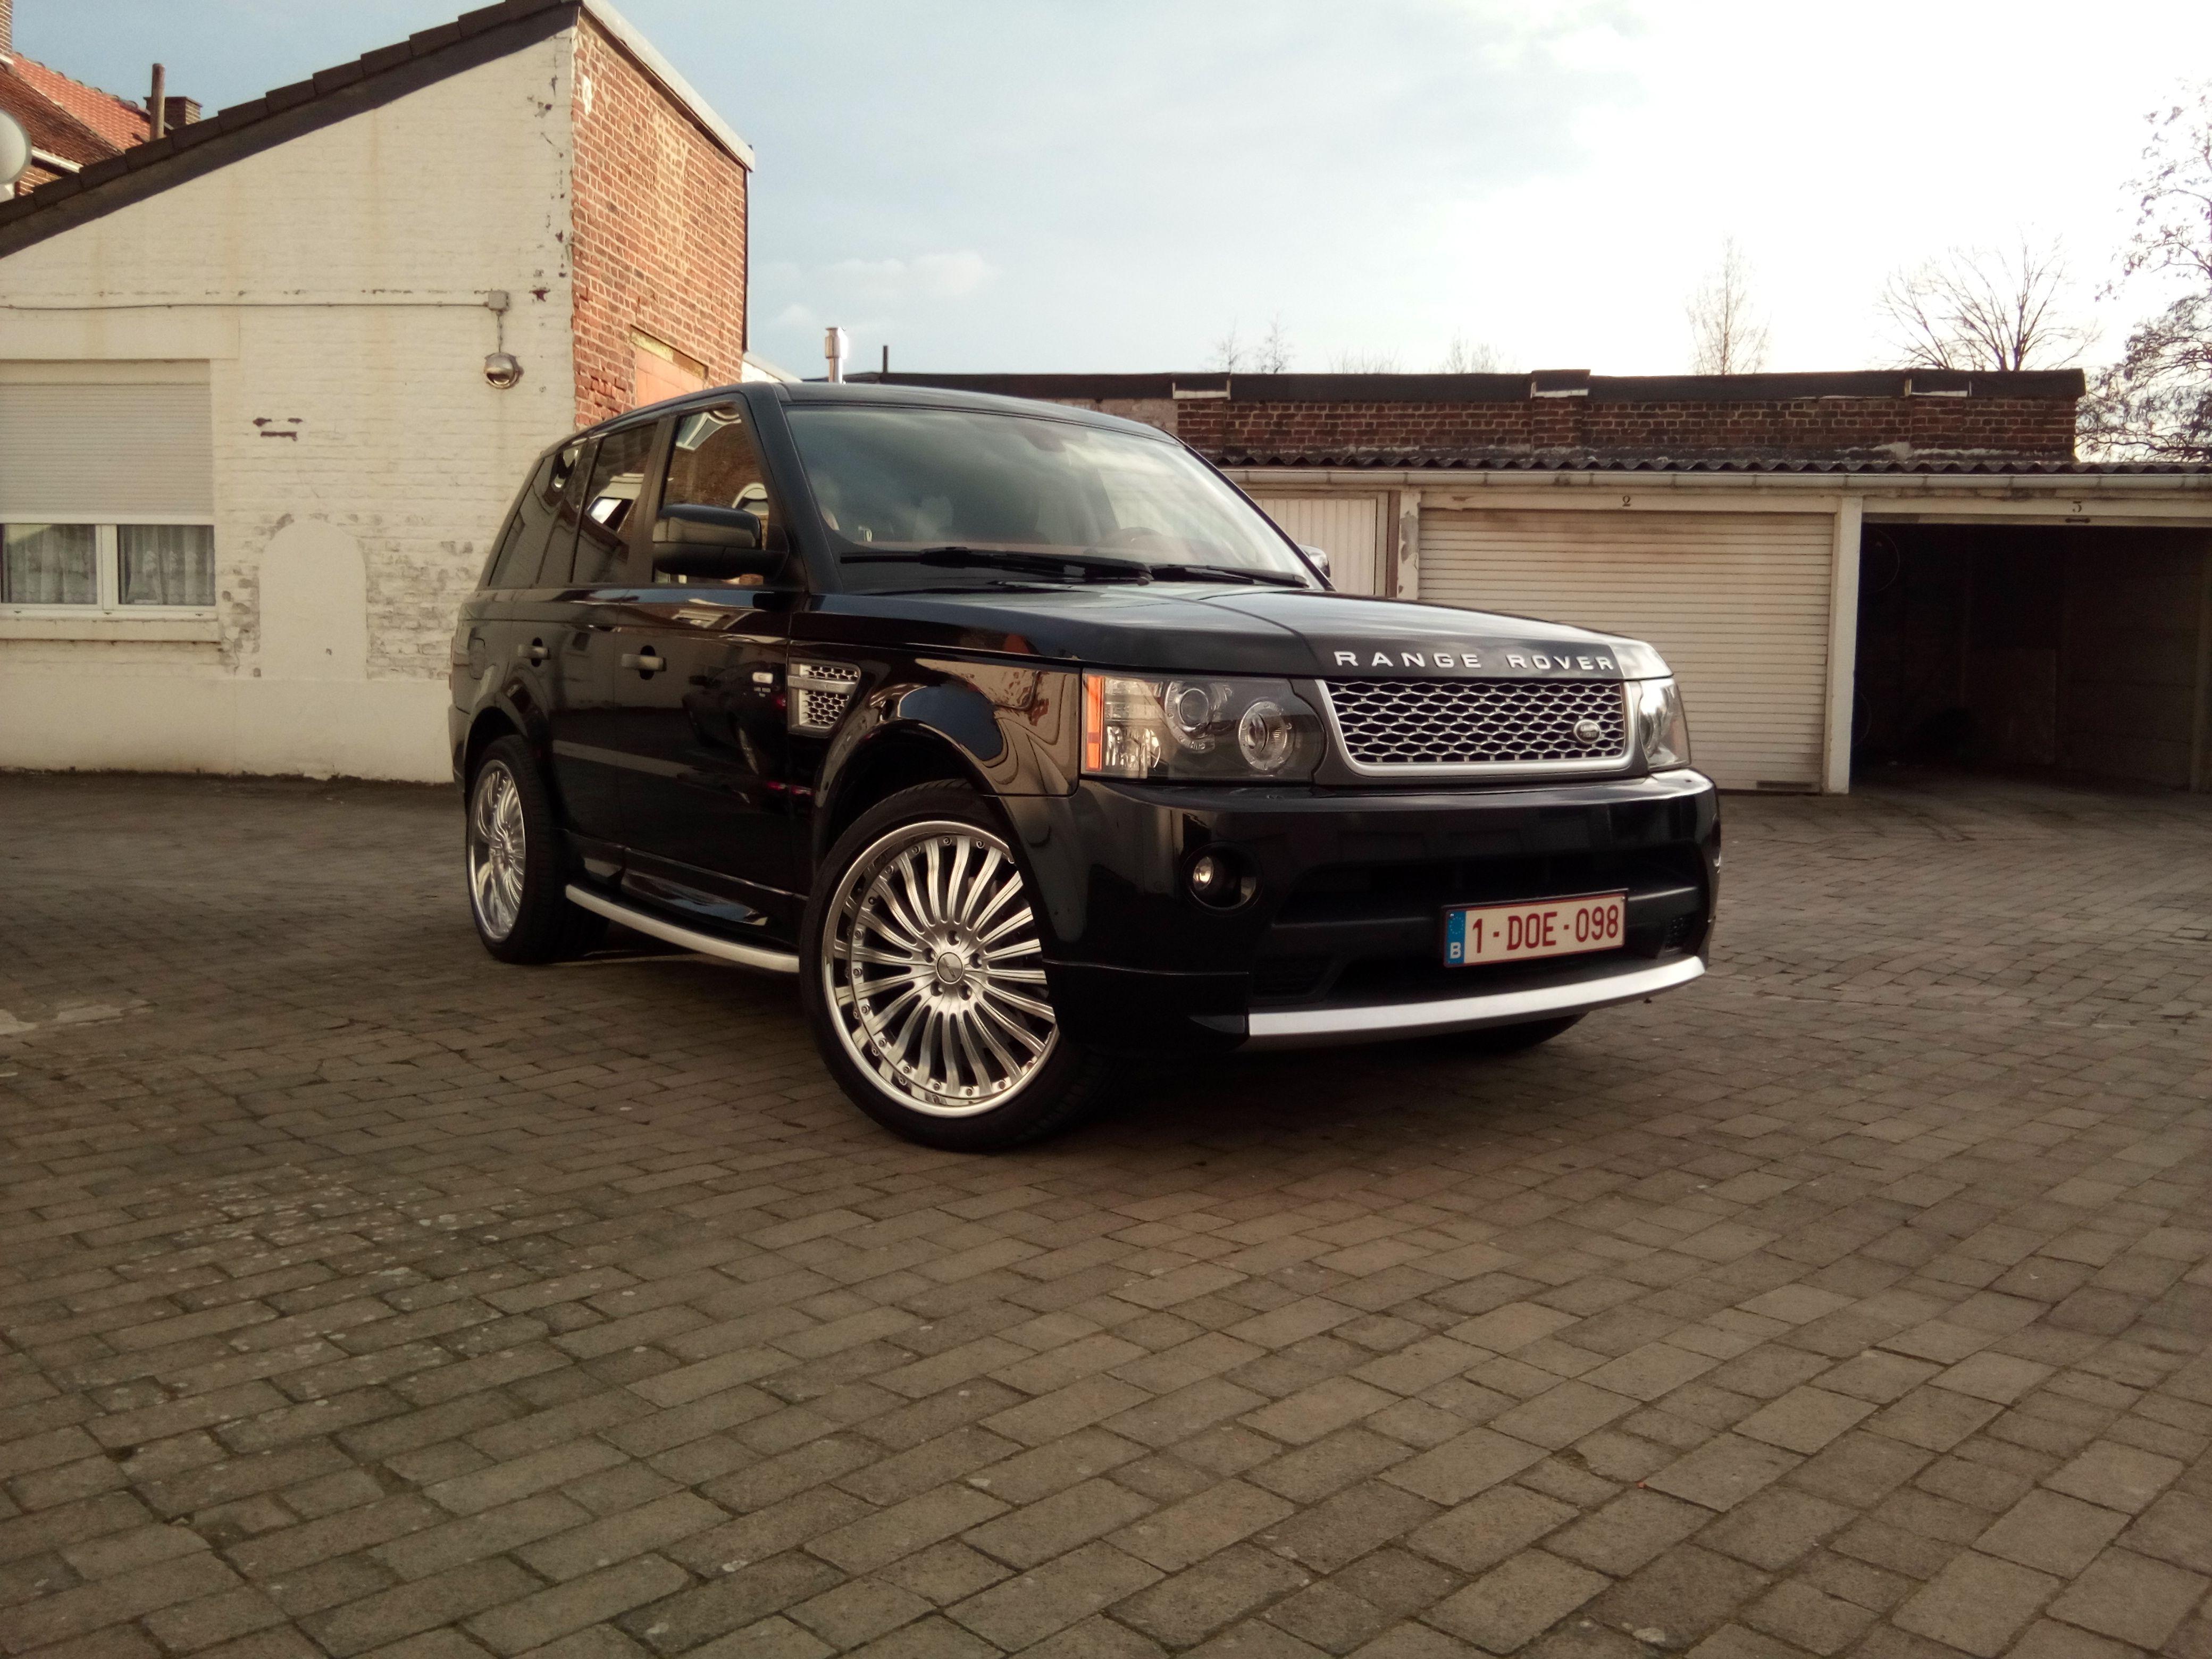 Pin By Elena Pavlikova On Range Rover Black Range Rover Black Range Rover Suv Car